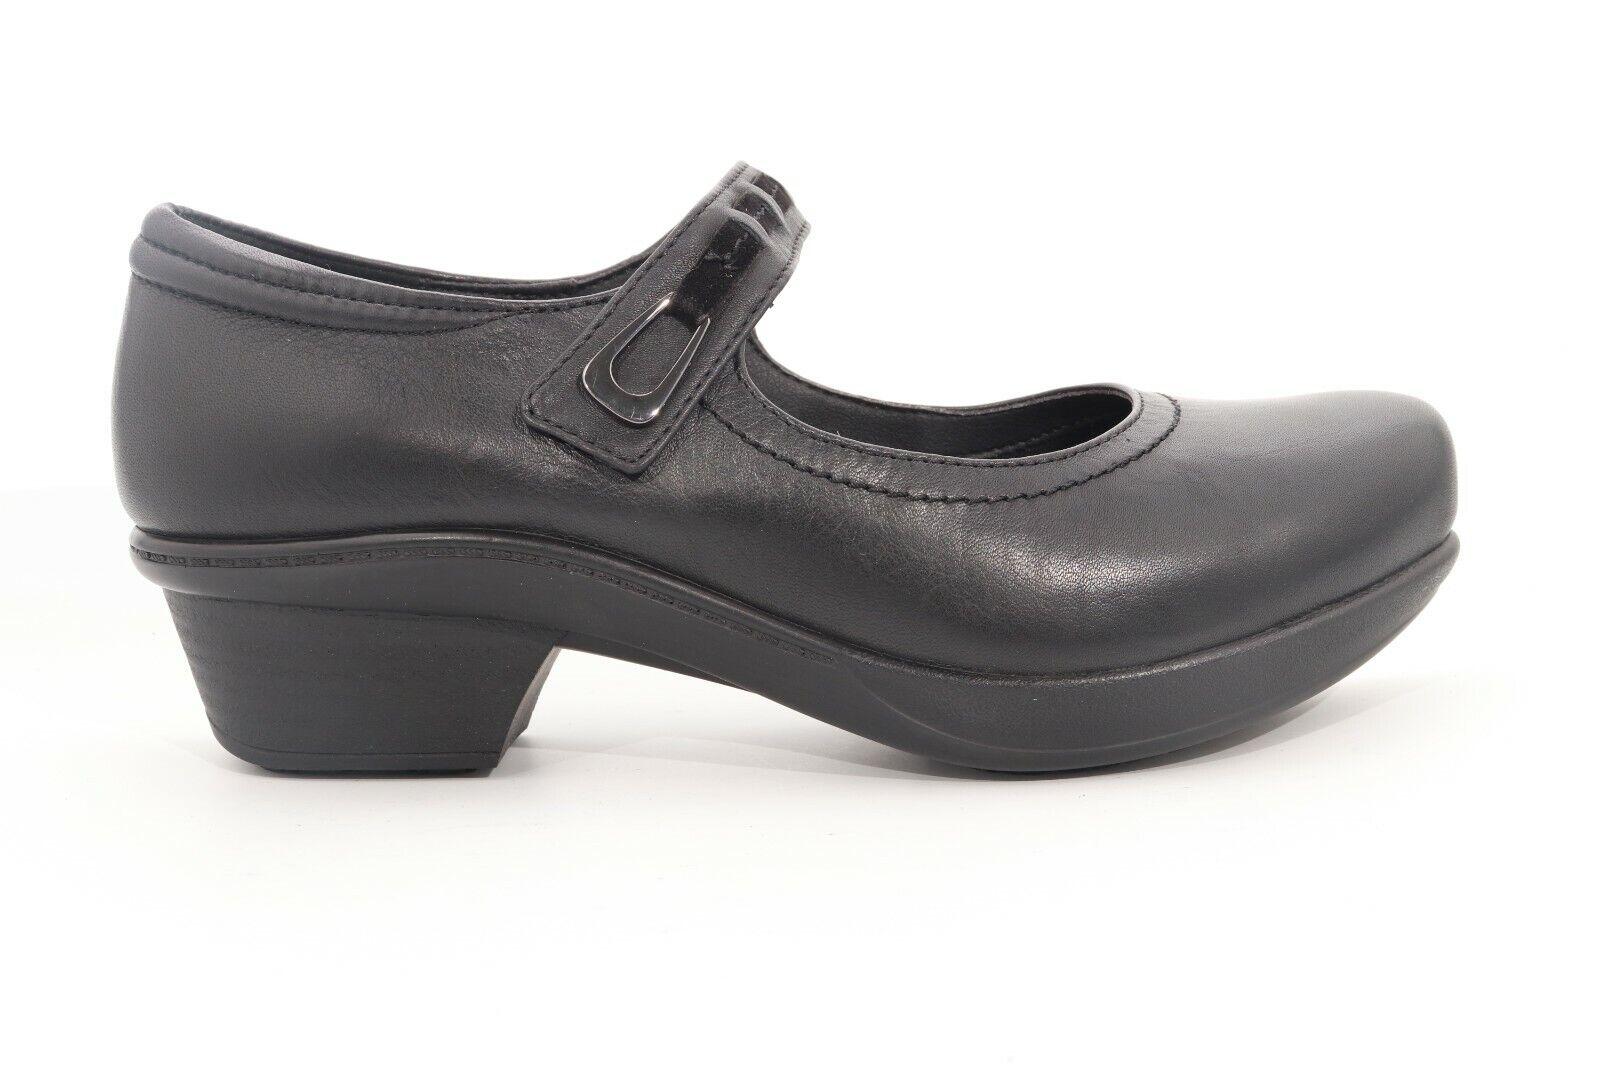 Abeo Pro System Candace Mary Jane - Resistant Black women's Size US 8.5